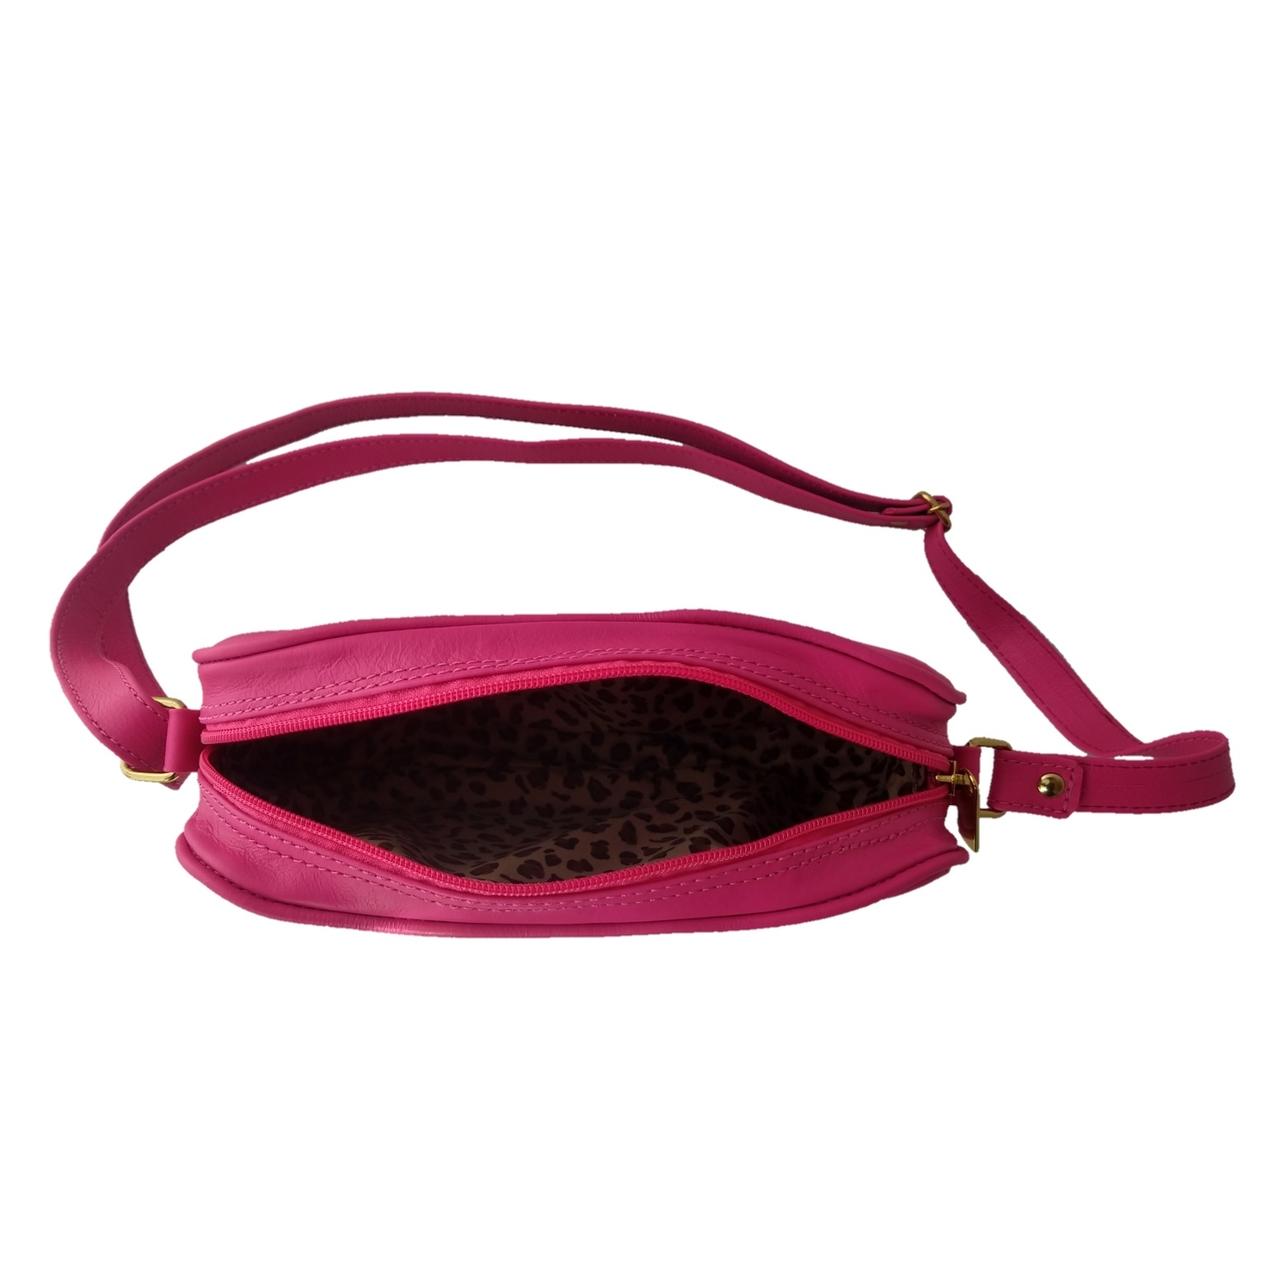 Bolsa Transversal TopGrife Matelassê Couro Pink  - SAPATOWEB.COM